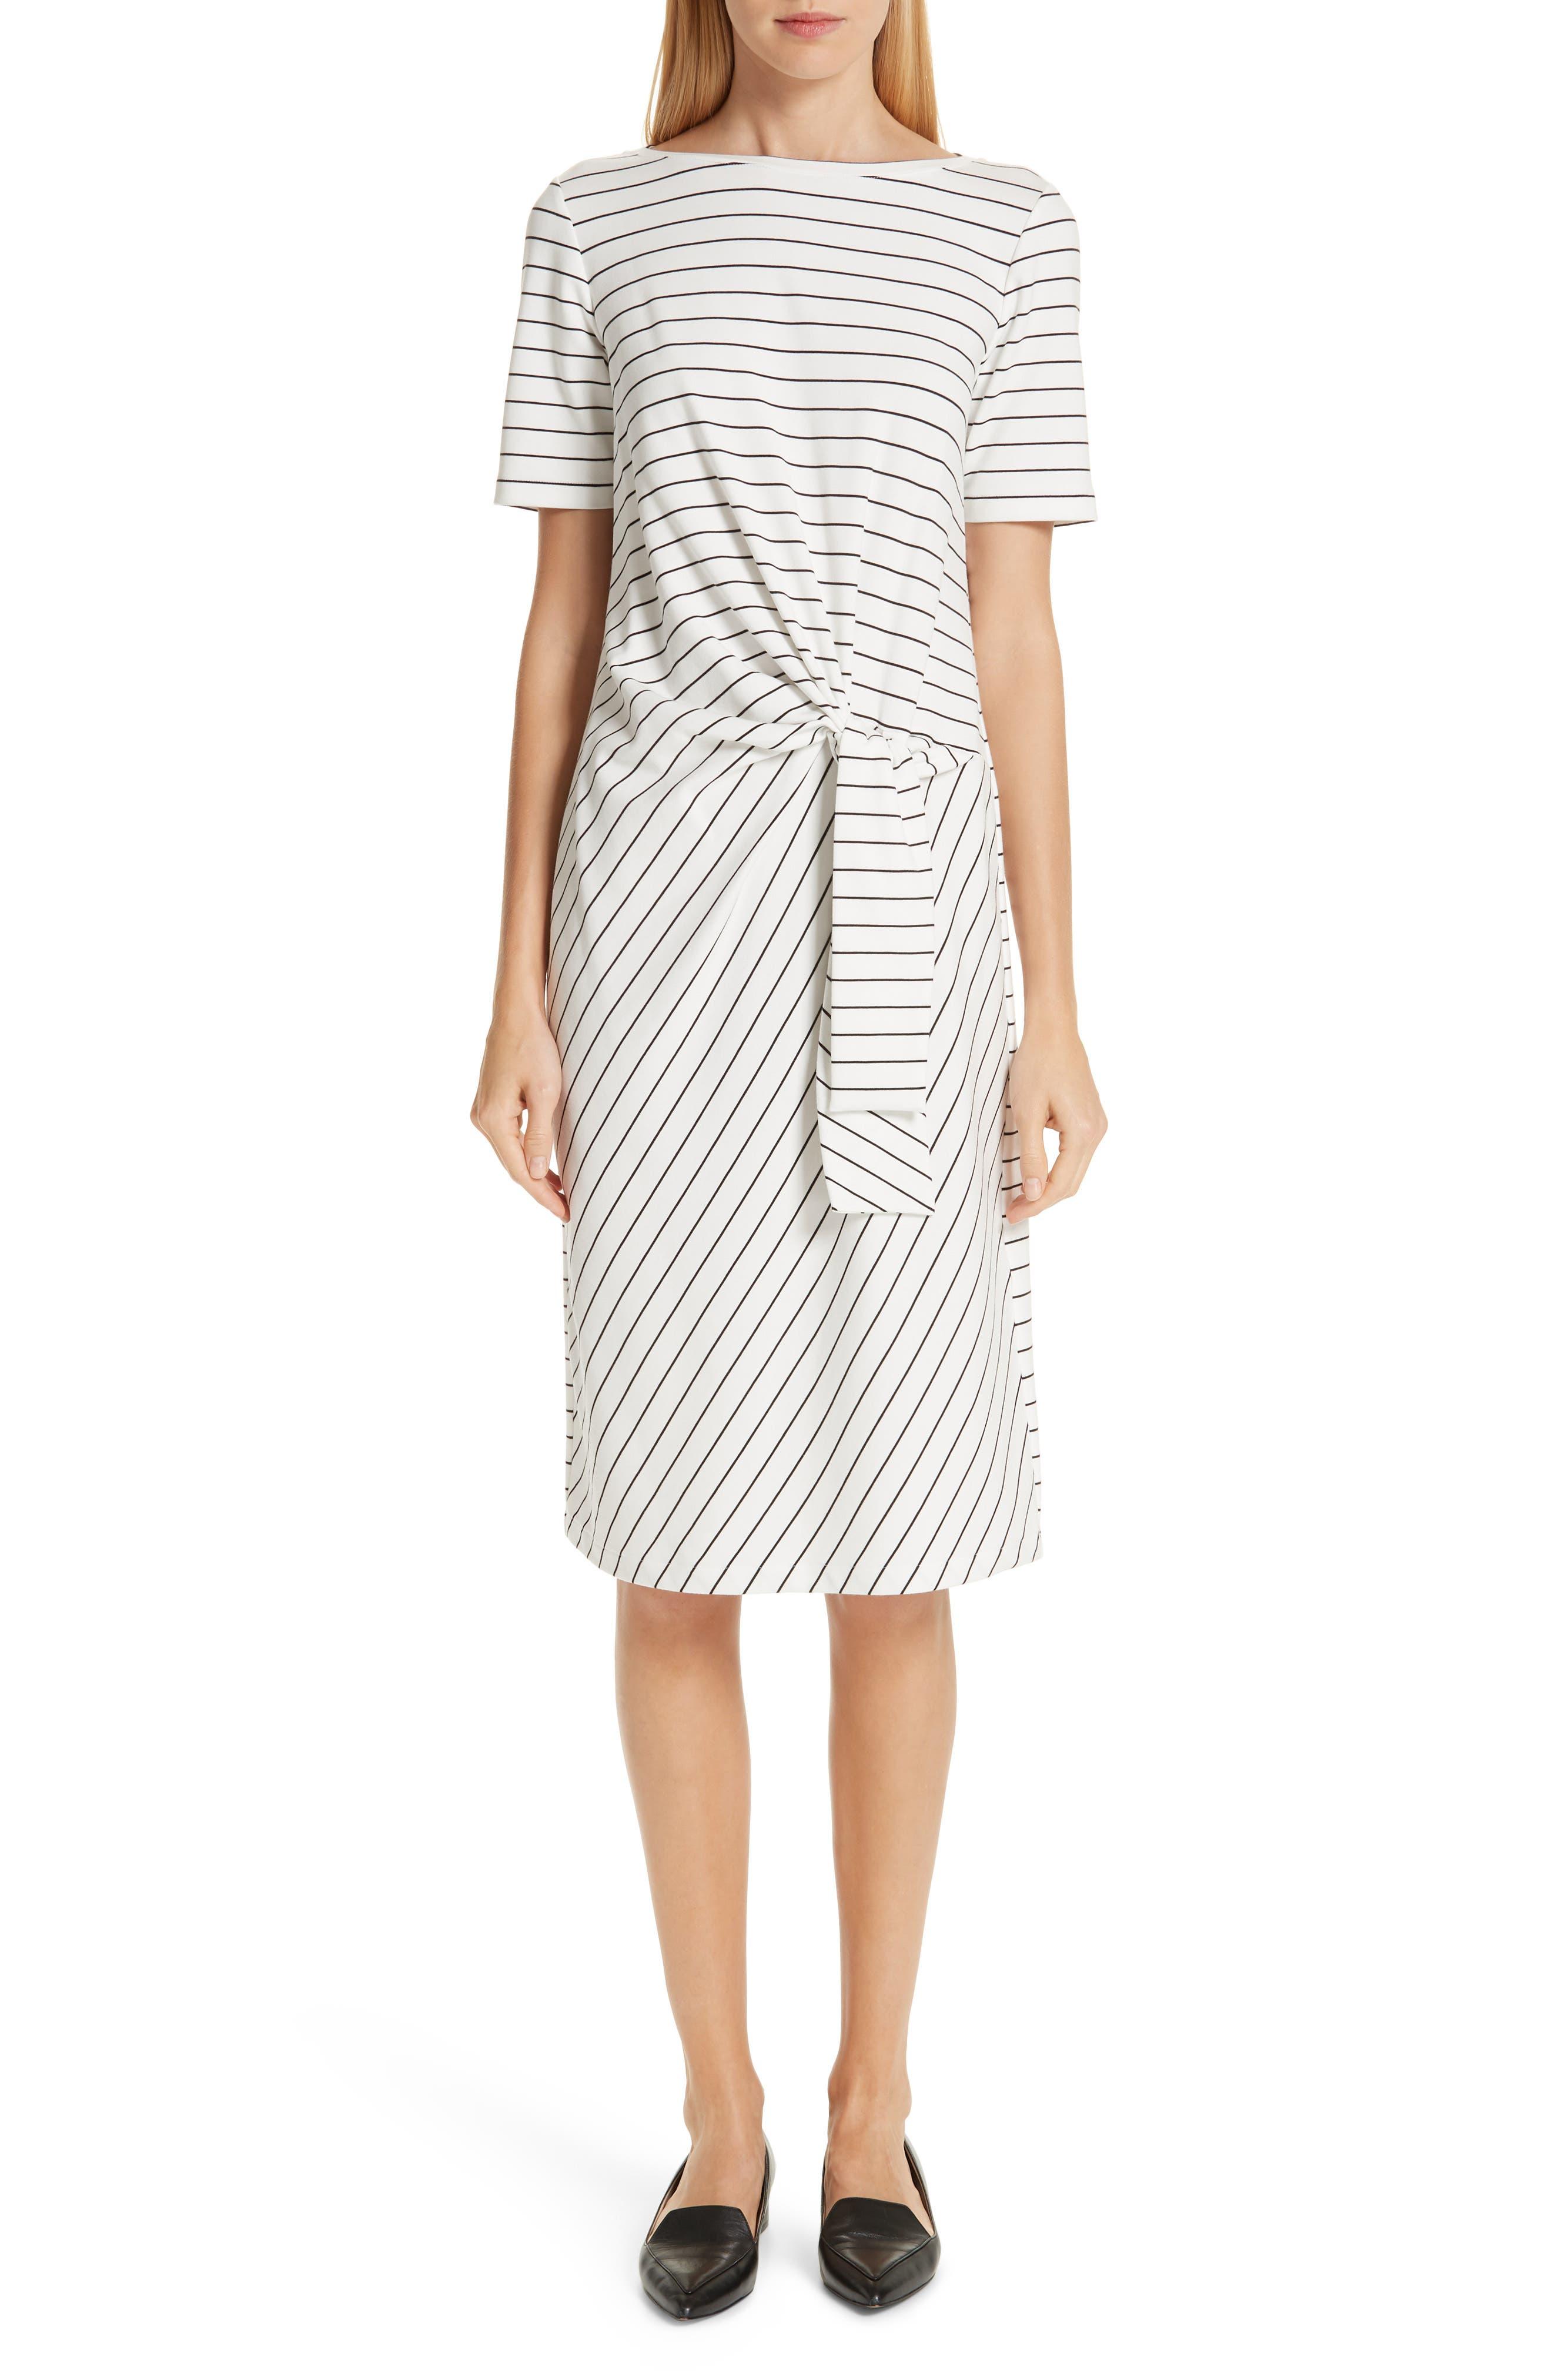 Lafayette 148 New York Glendora Knotted Stripe Dress, White